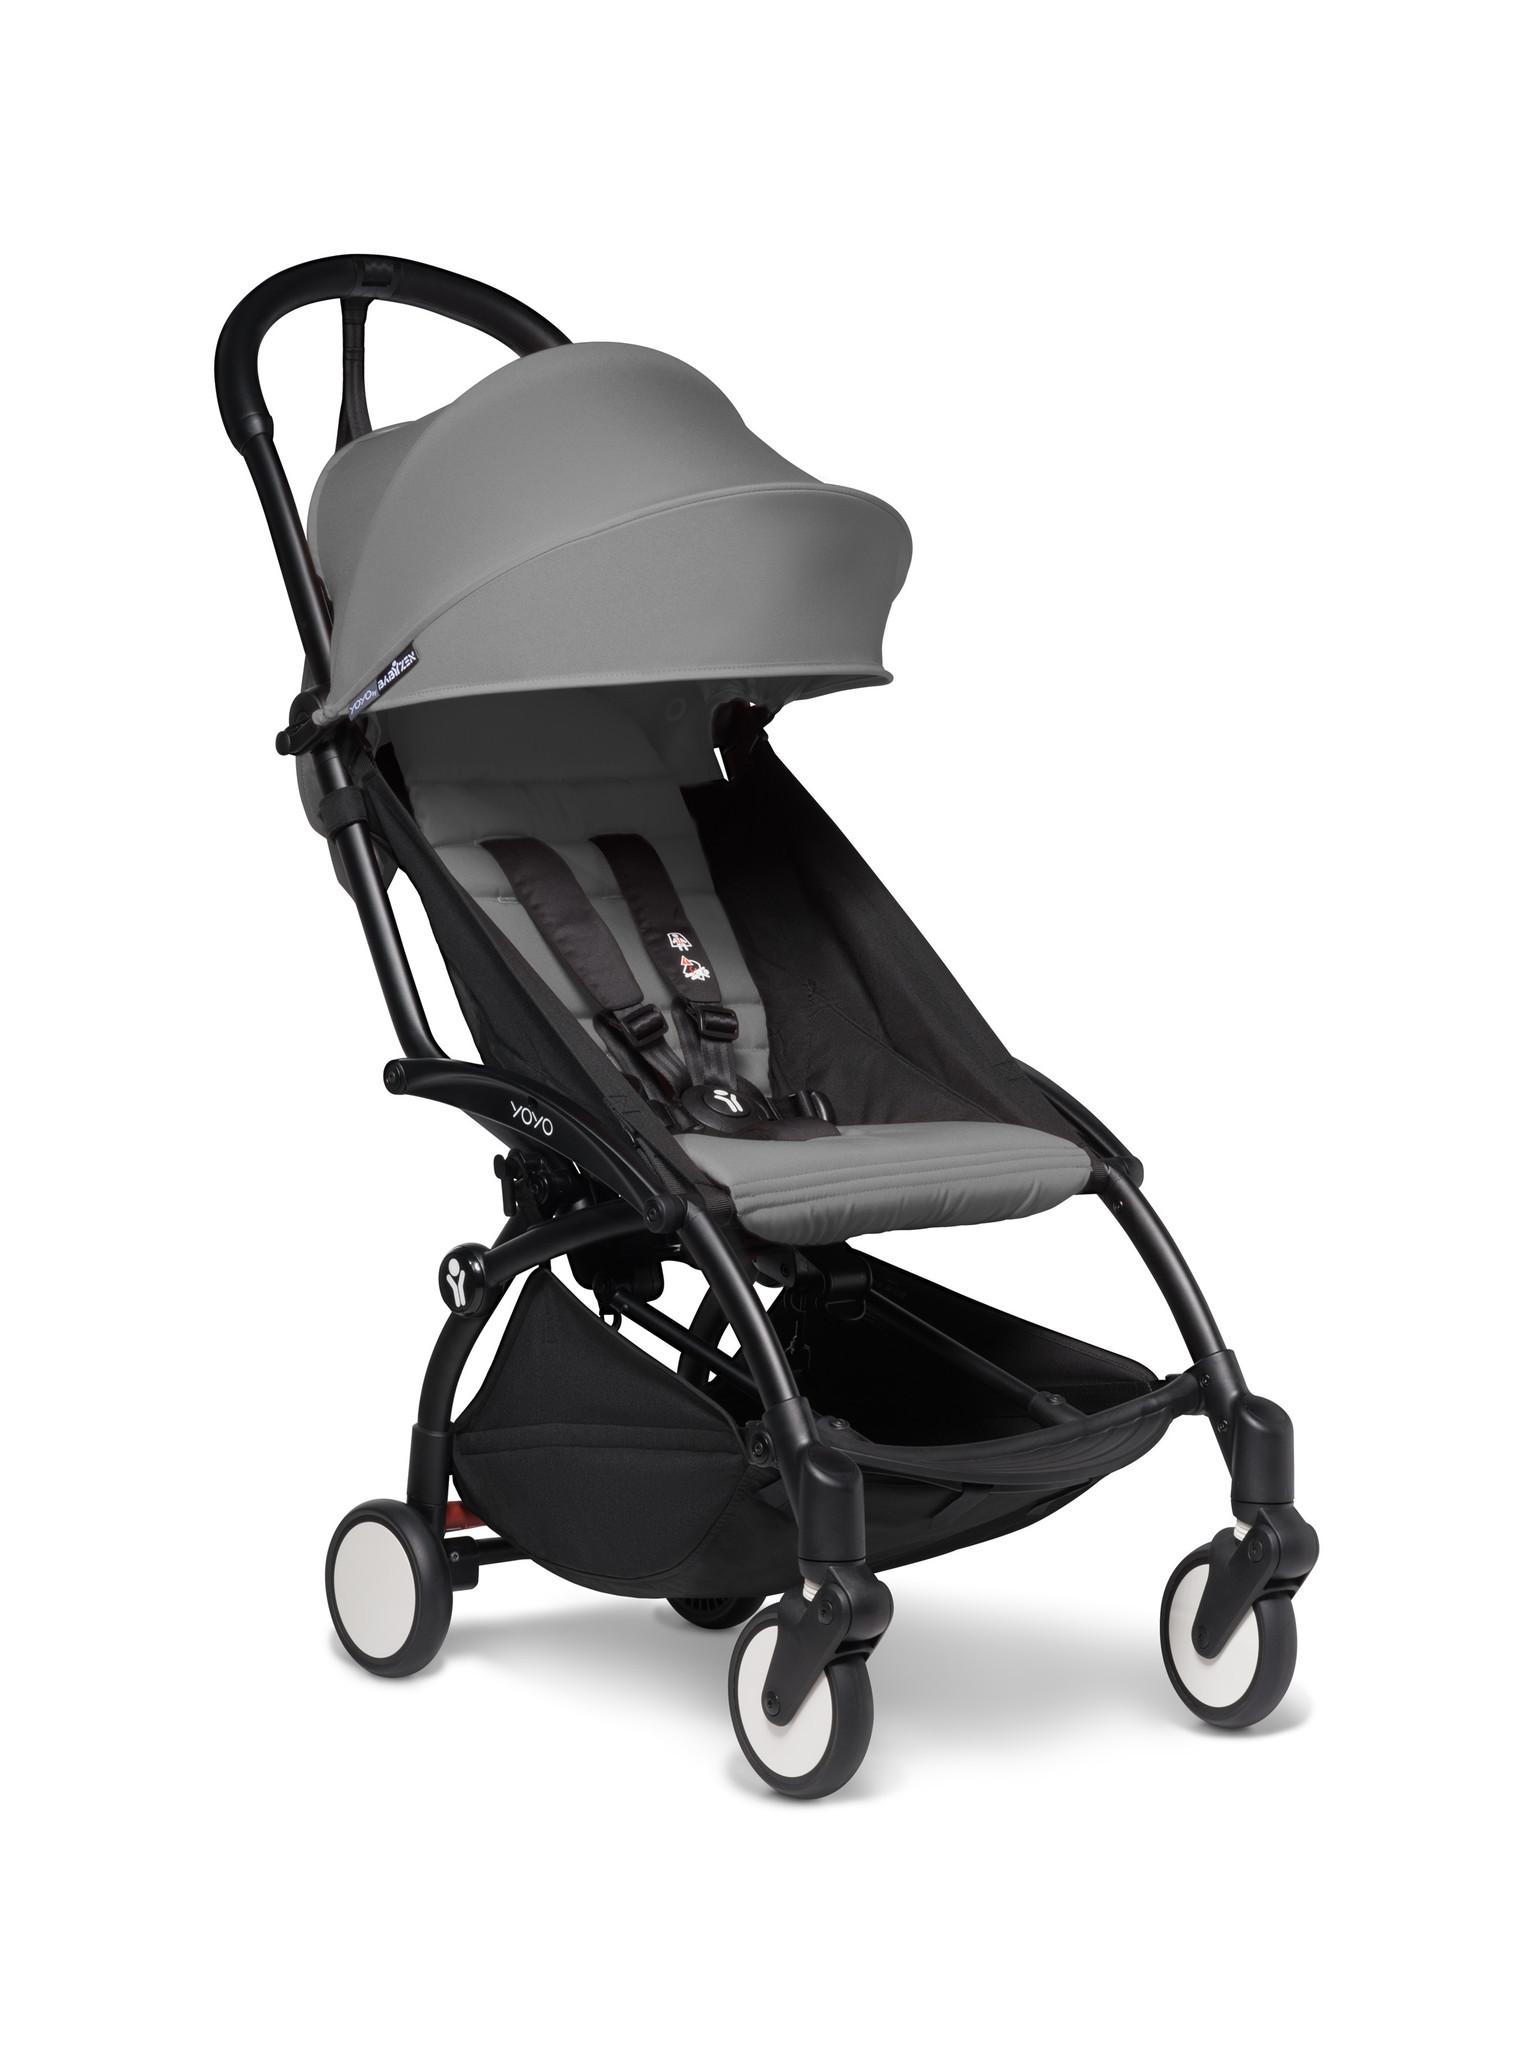 Babyzen Babyzen YOYO² buggy 6+ grijs frame zwart